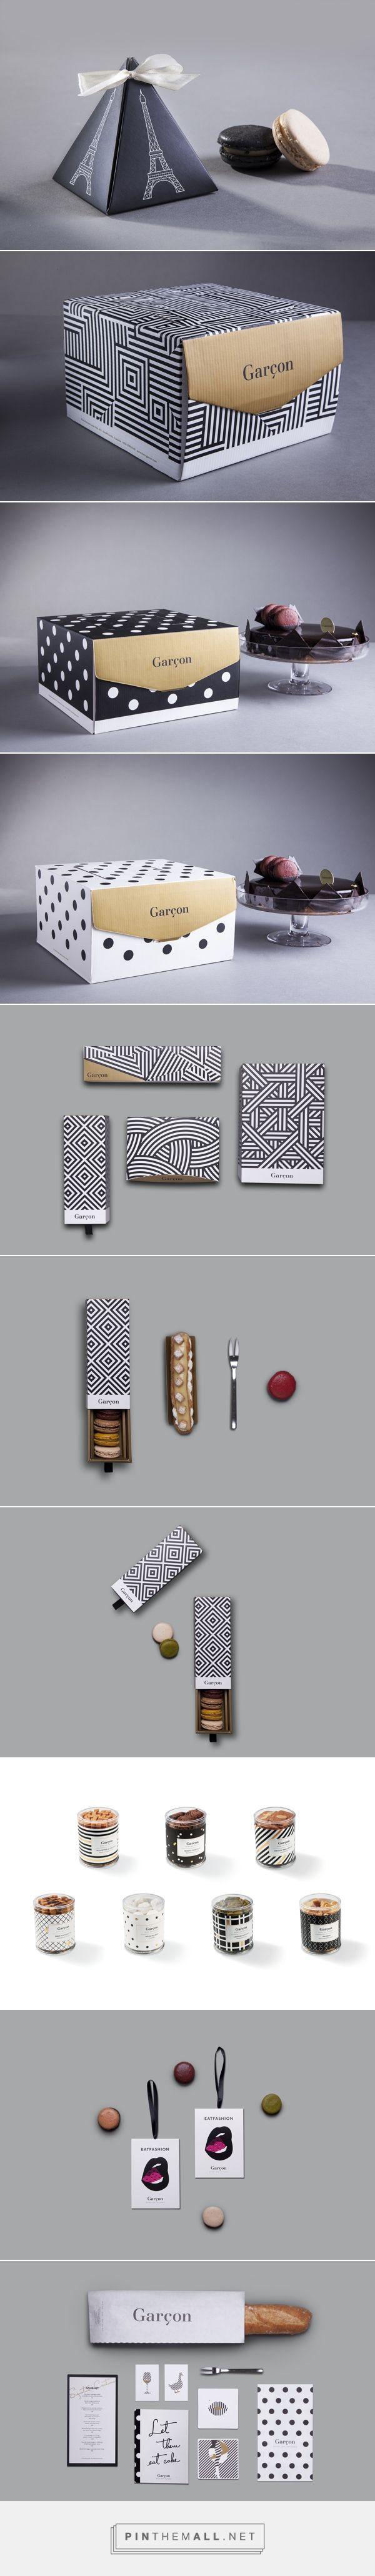 Garçon on Behance | Brownfox Studio